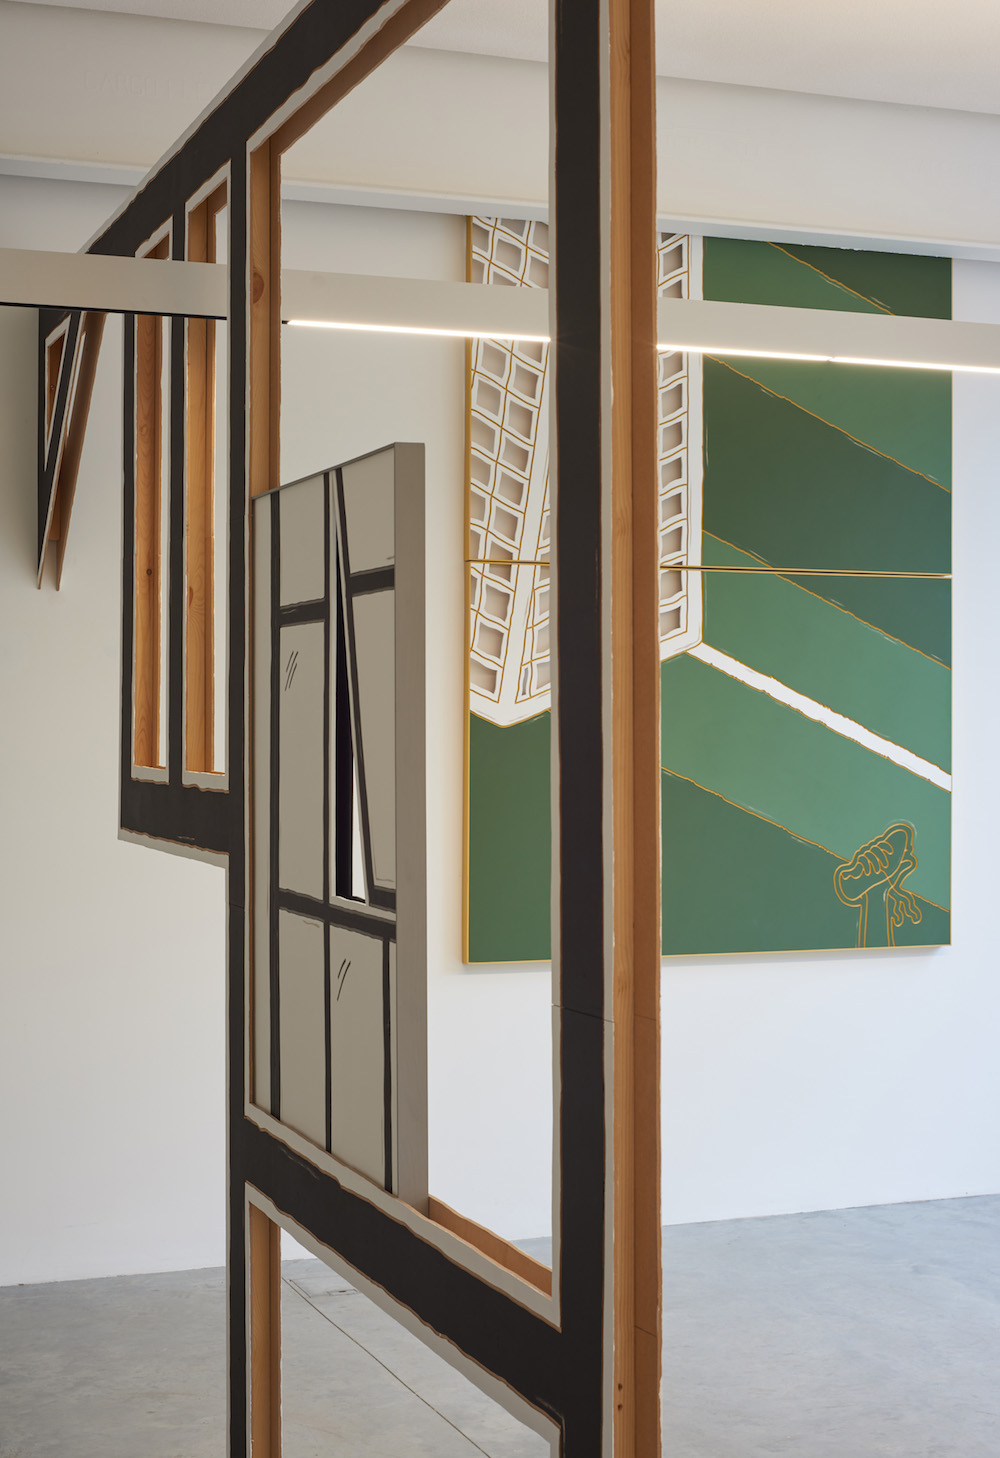 Milly Peck, LOUD KNOCK, 2017. Installation view. Matt's Gallery, London, UK.